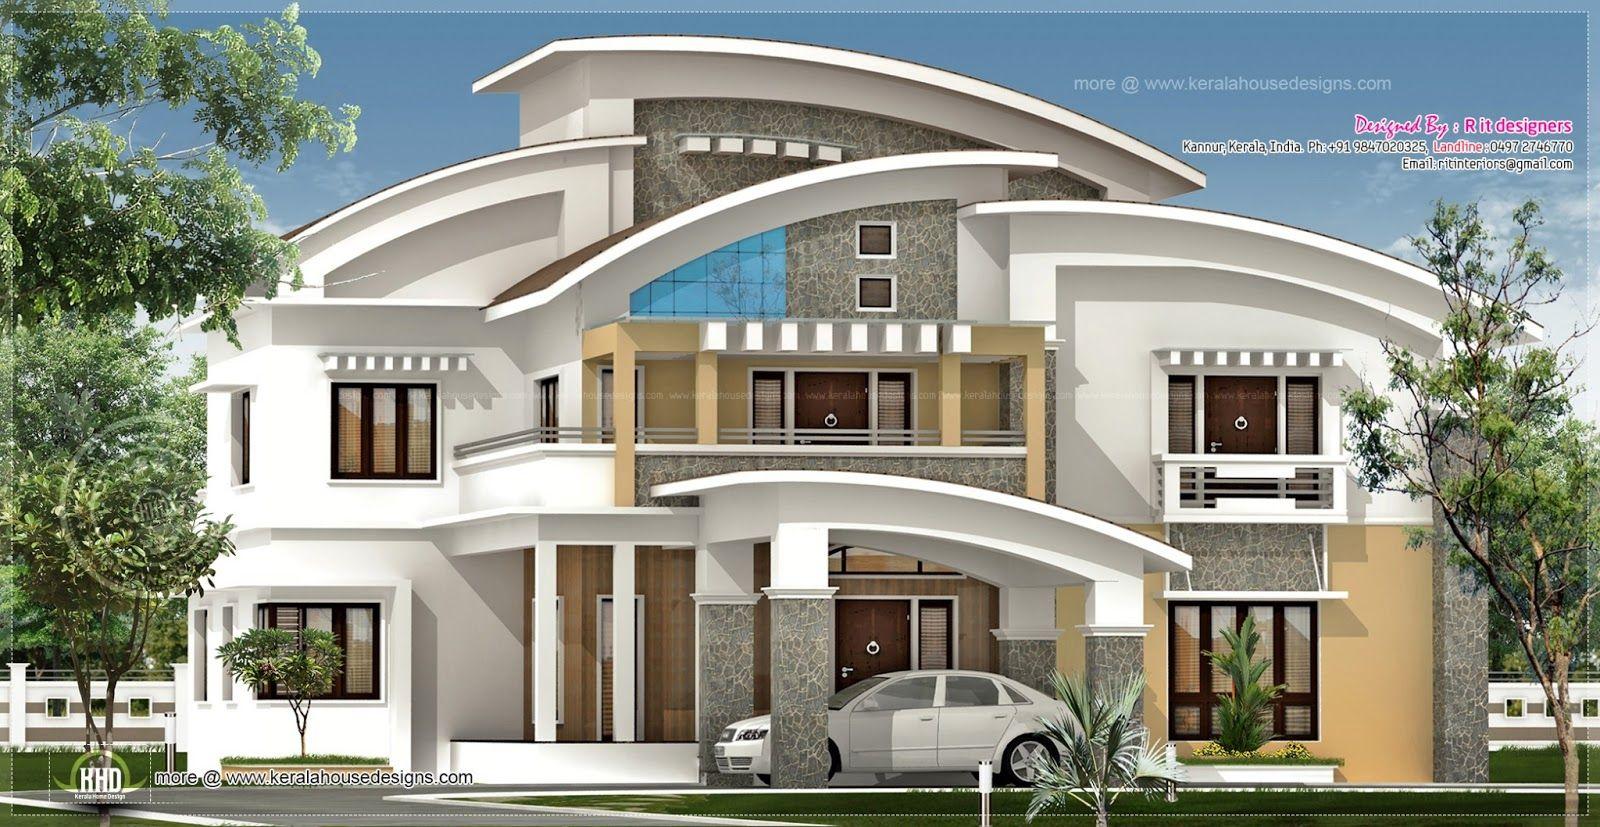 Concept Home Luxury Mansion Conceptual Design Luxury Mansion